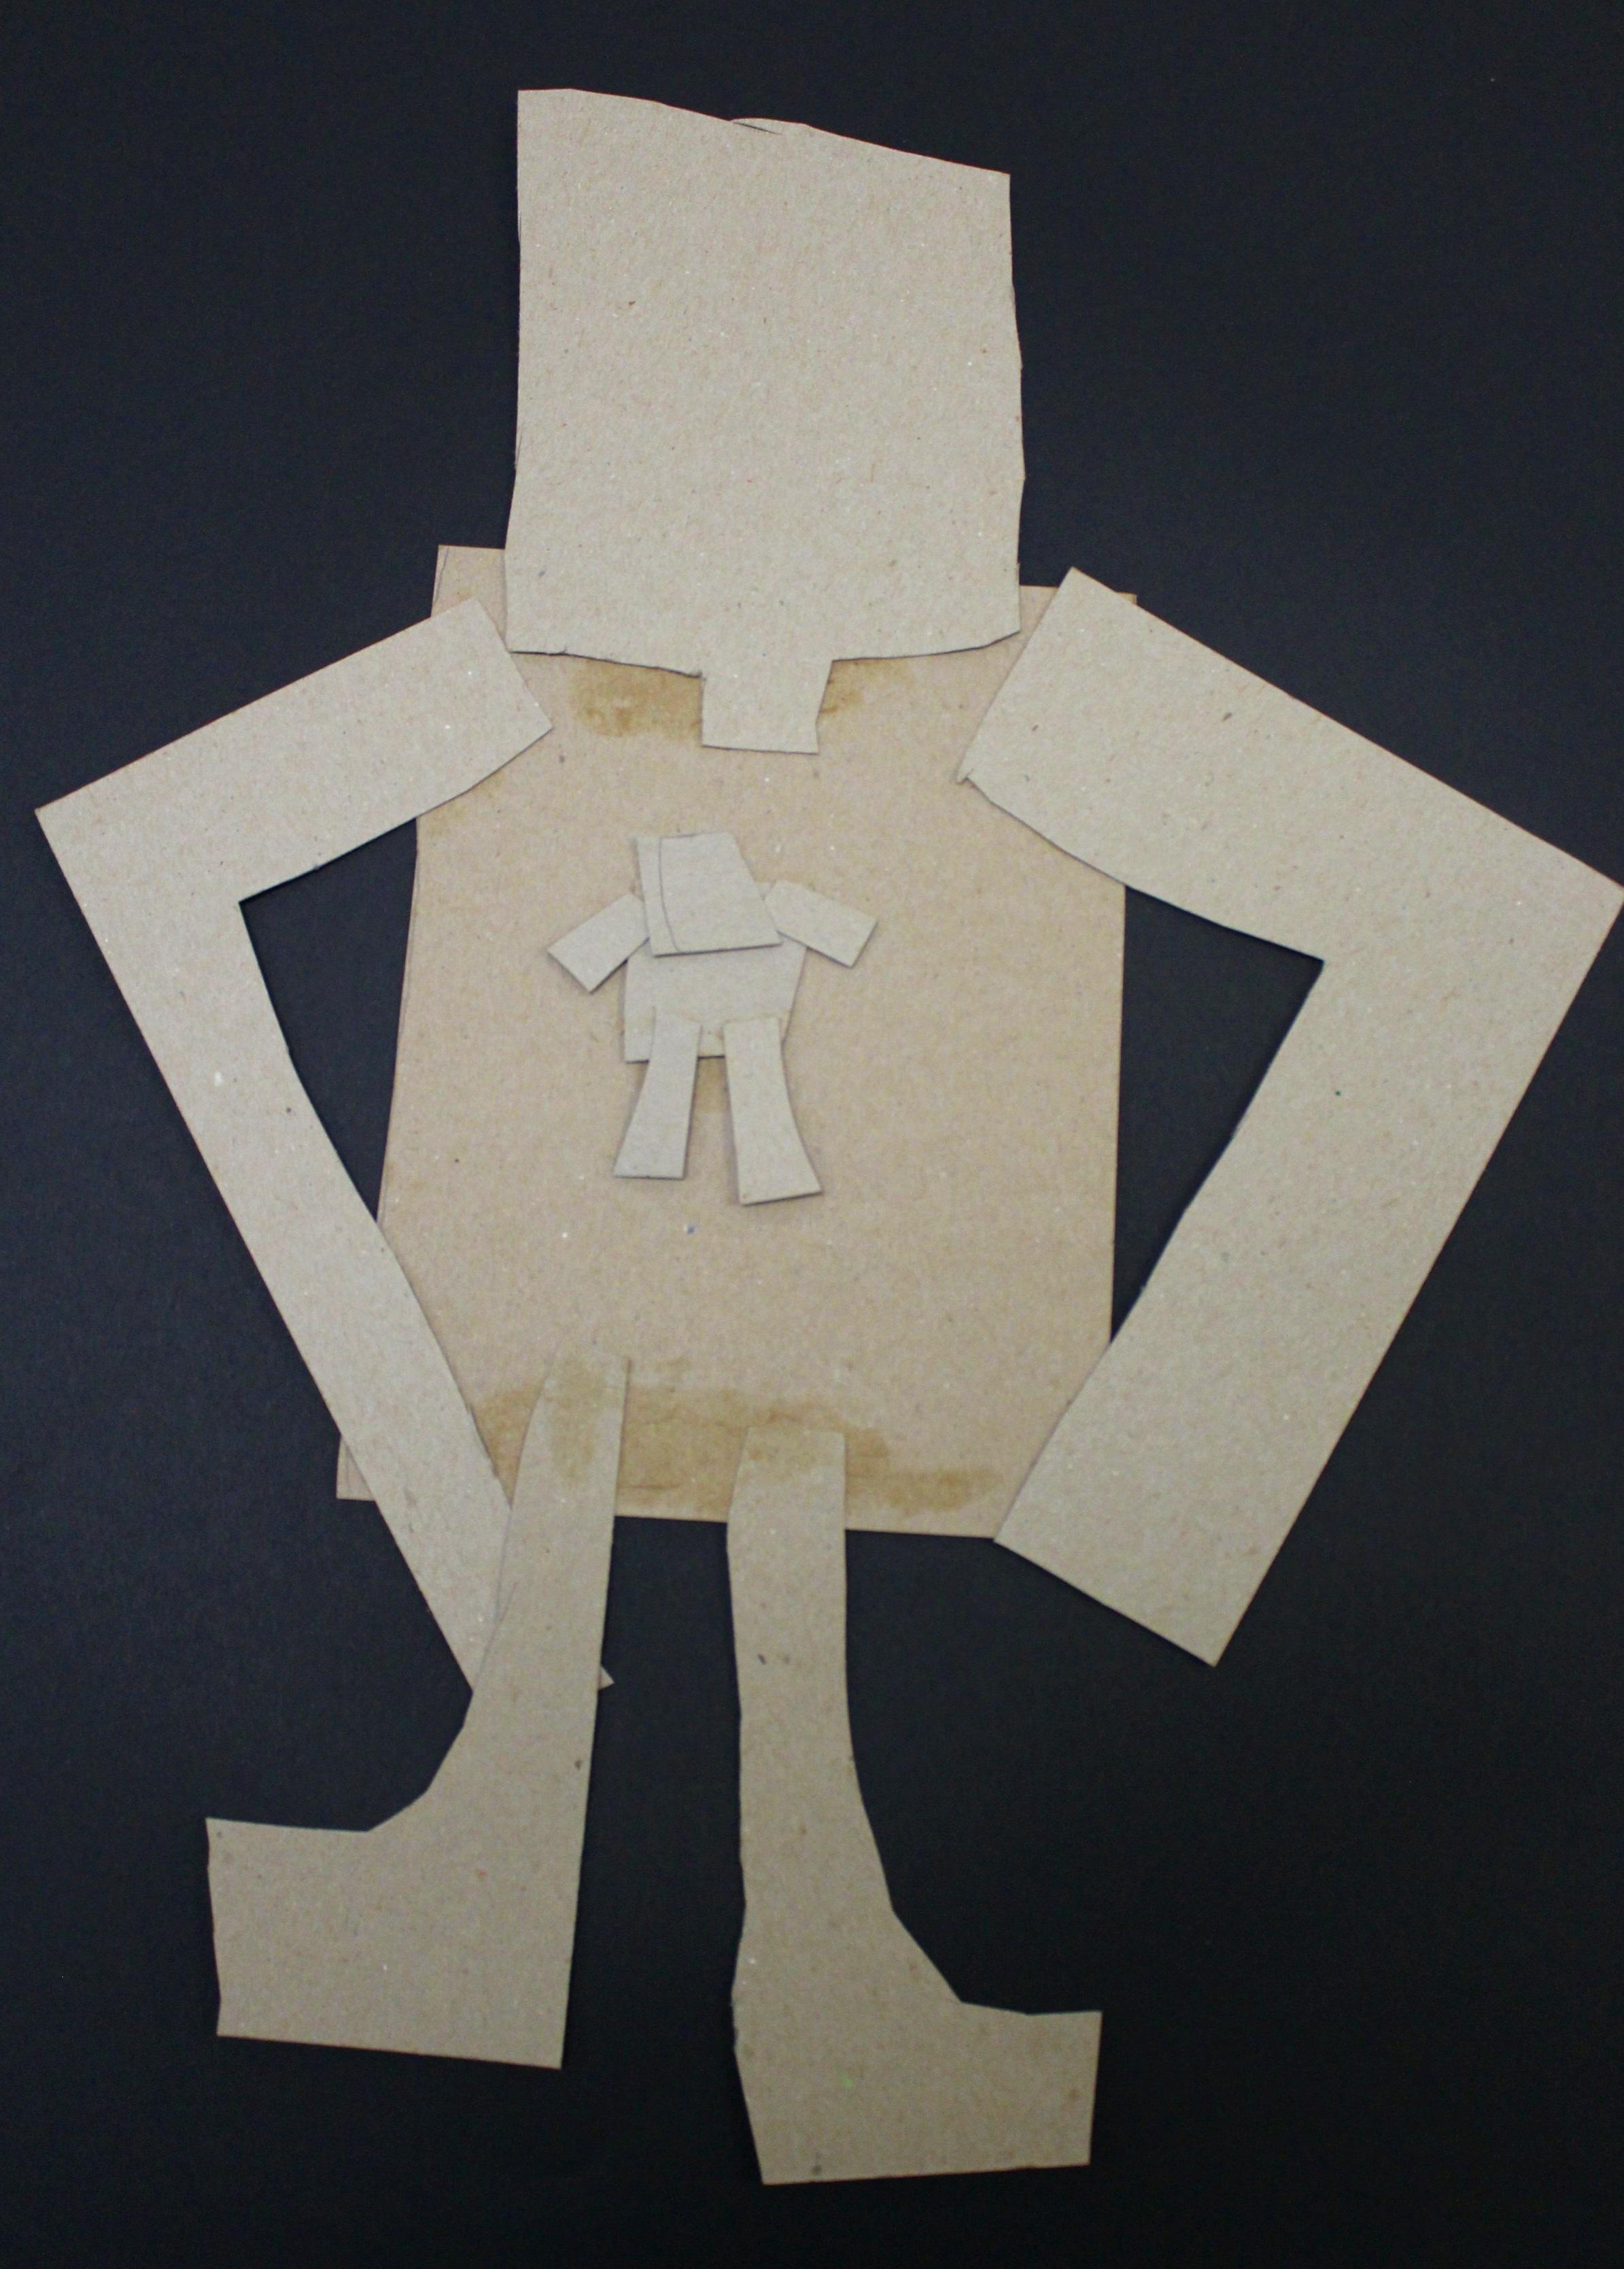 1st Grade: Thomas B. - Recycled Robots (Work In Progress)